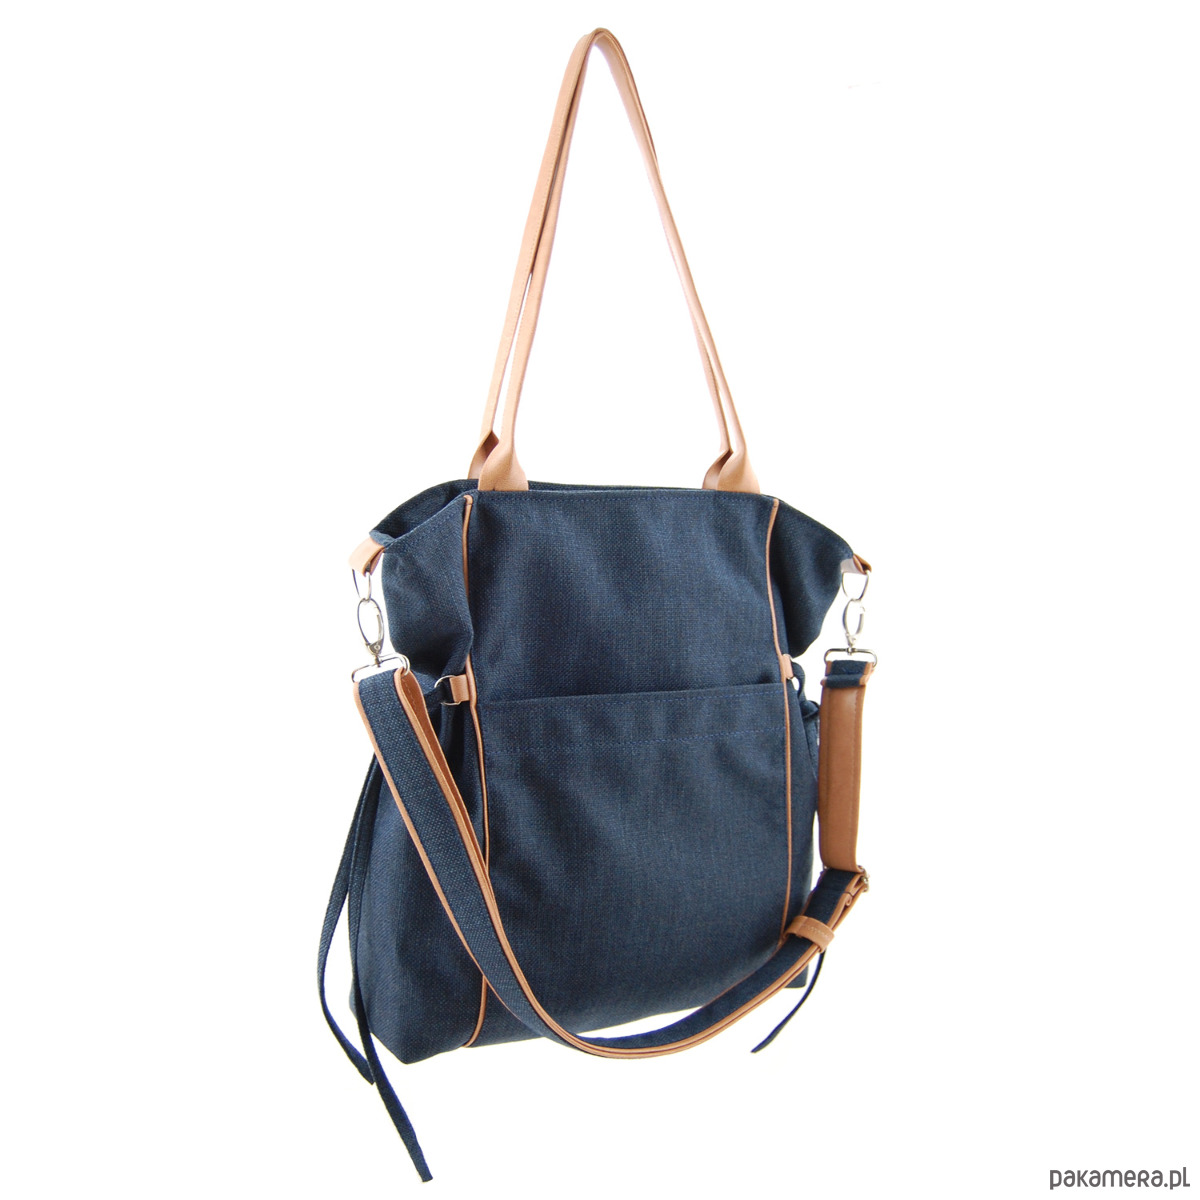 5a1933d0aa53a AMBER - duża torba - granatowa plecionka - torby na ramię - damskie ...